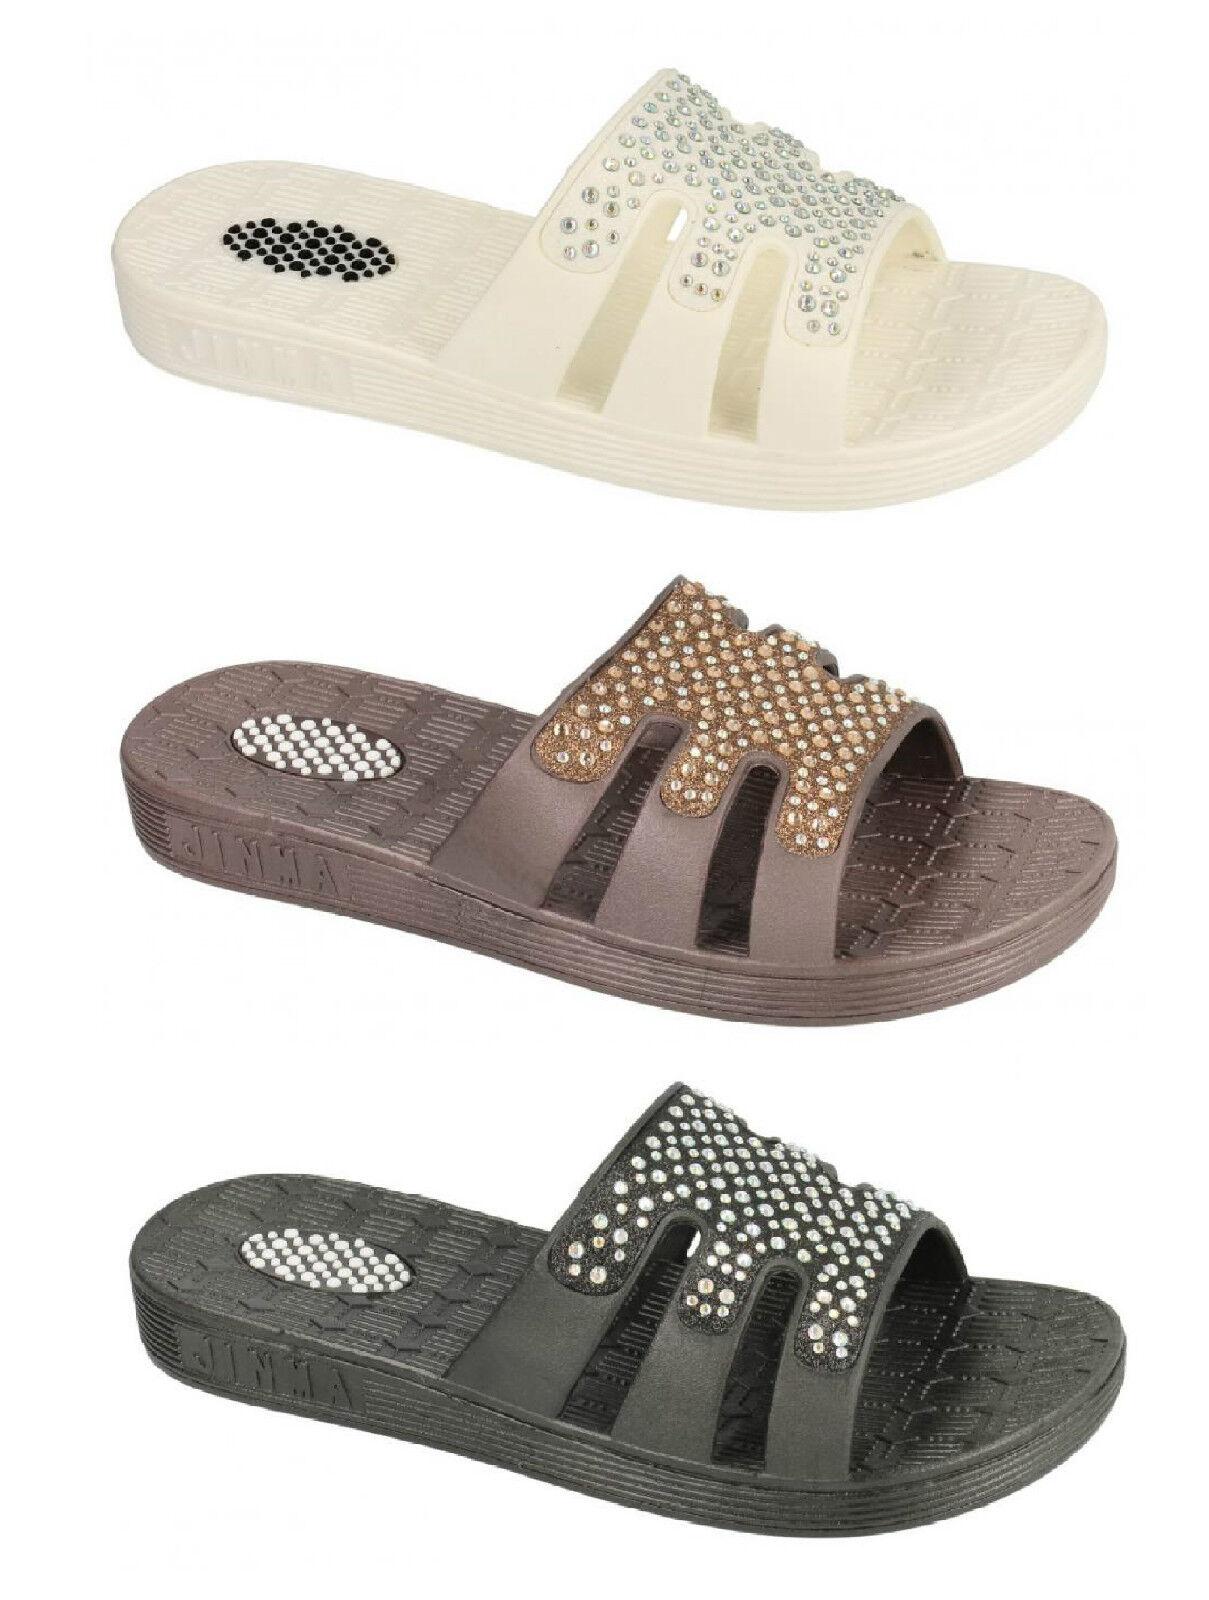 SALE Ladies Unbranded Studded Shower Garden Beach Mules Sandals - F0782